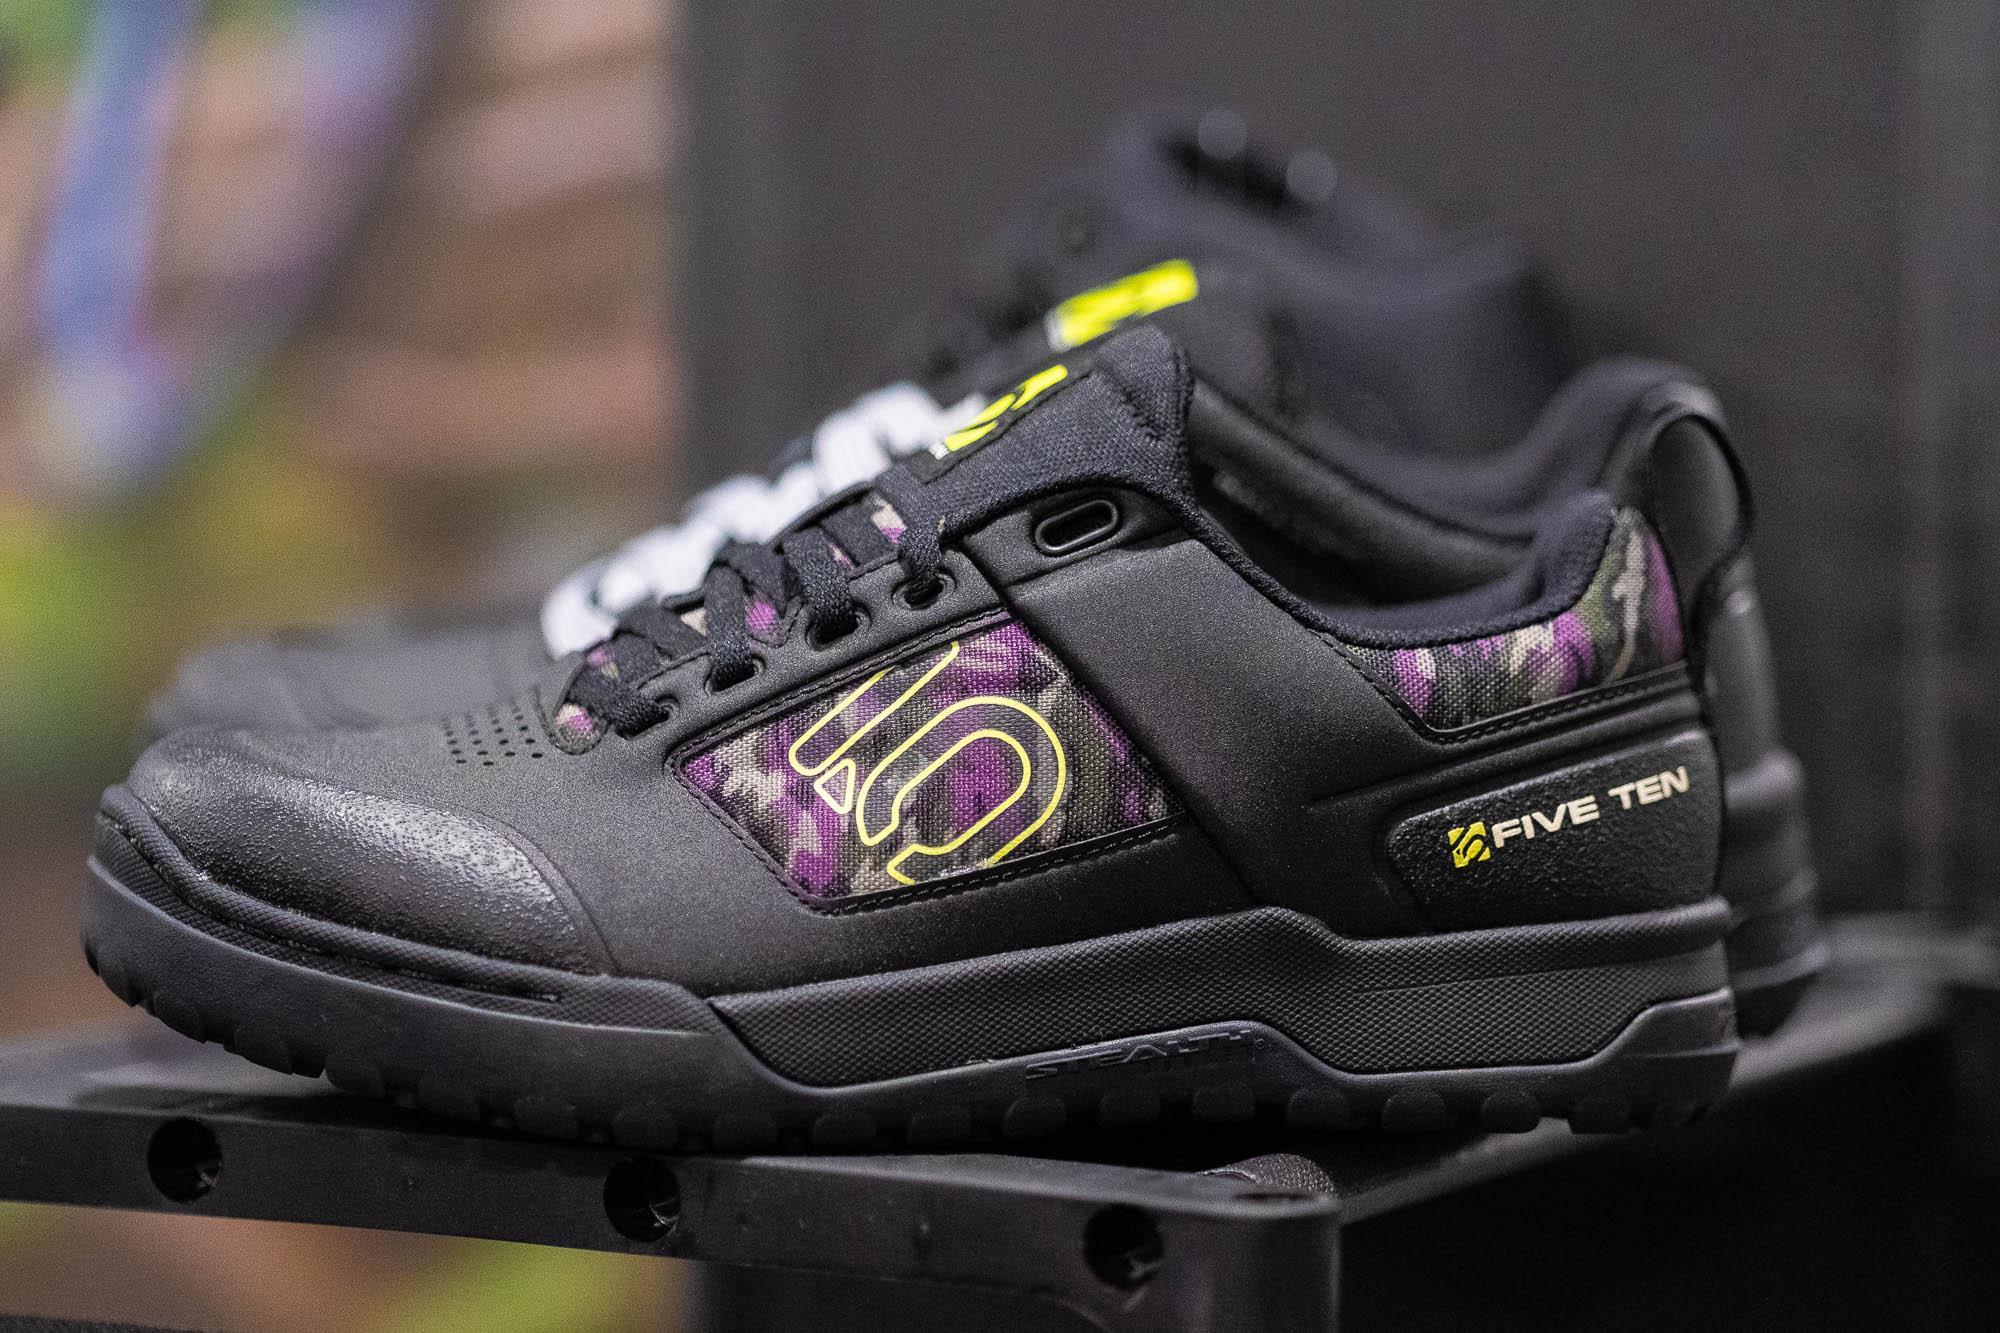 5.10 Grom Shoe